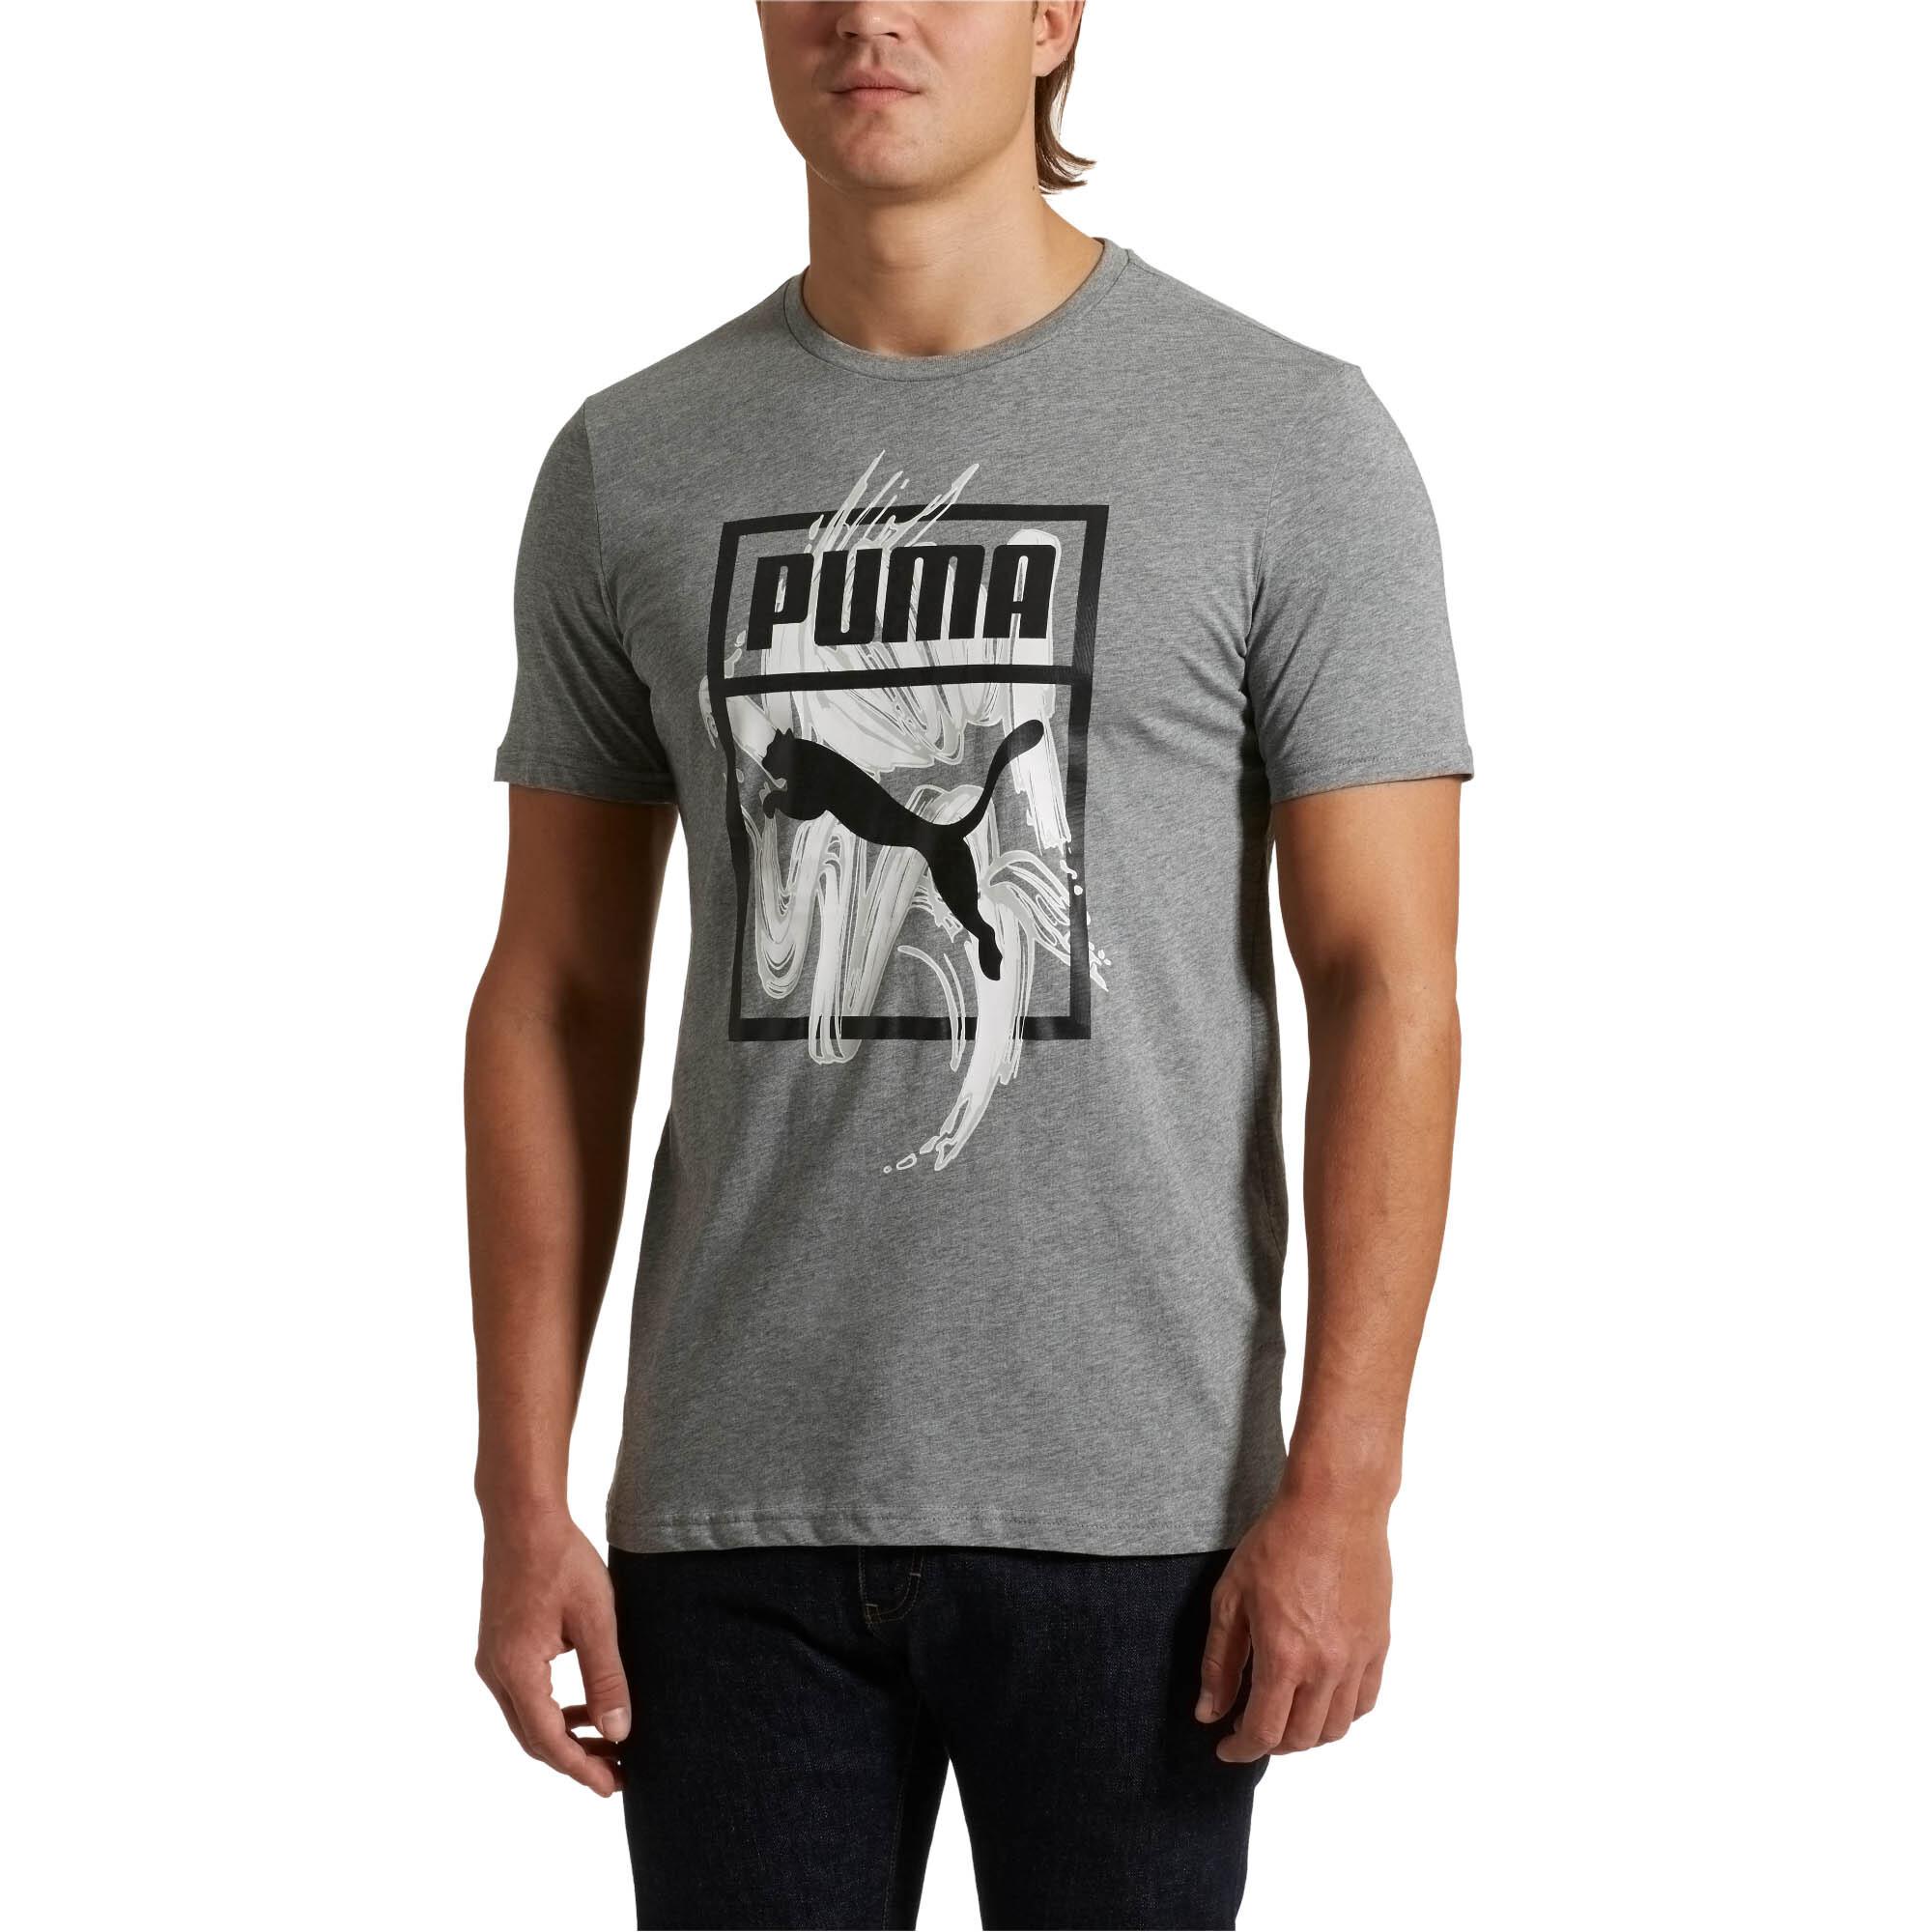 PUMA-Graphic-Logo-Brush-Tee-Men-Tee-Sport-Classics thumbnail 16